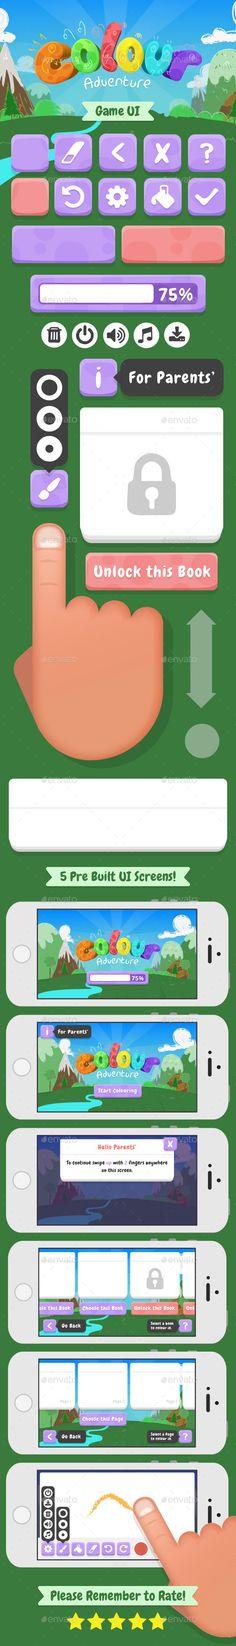 Game UI Kit Colour Adventure - Download: http://graphicriver.net/item/game-ui-kit-colour-adventure/15509732?ref=sinzo #Game #Kits #GameAssets